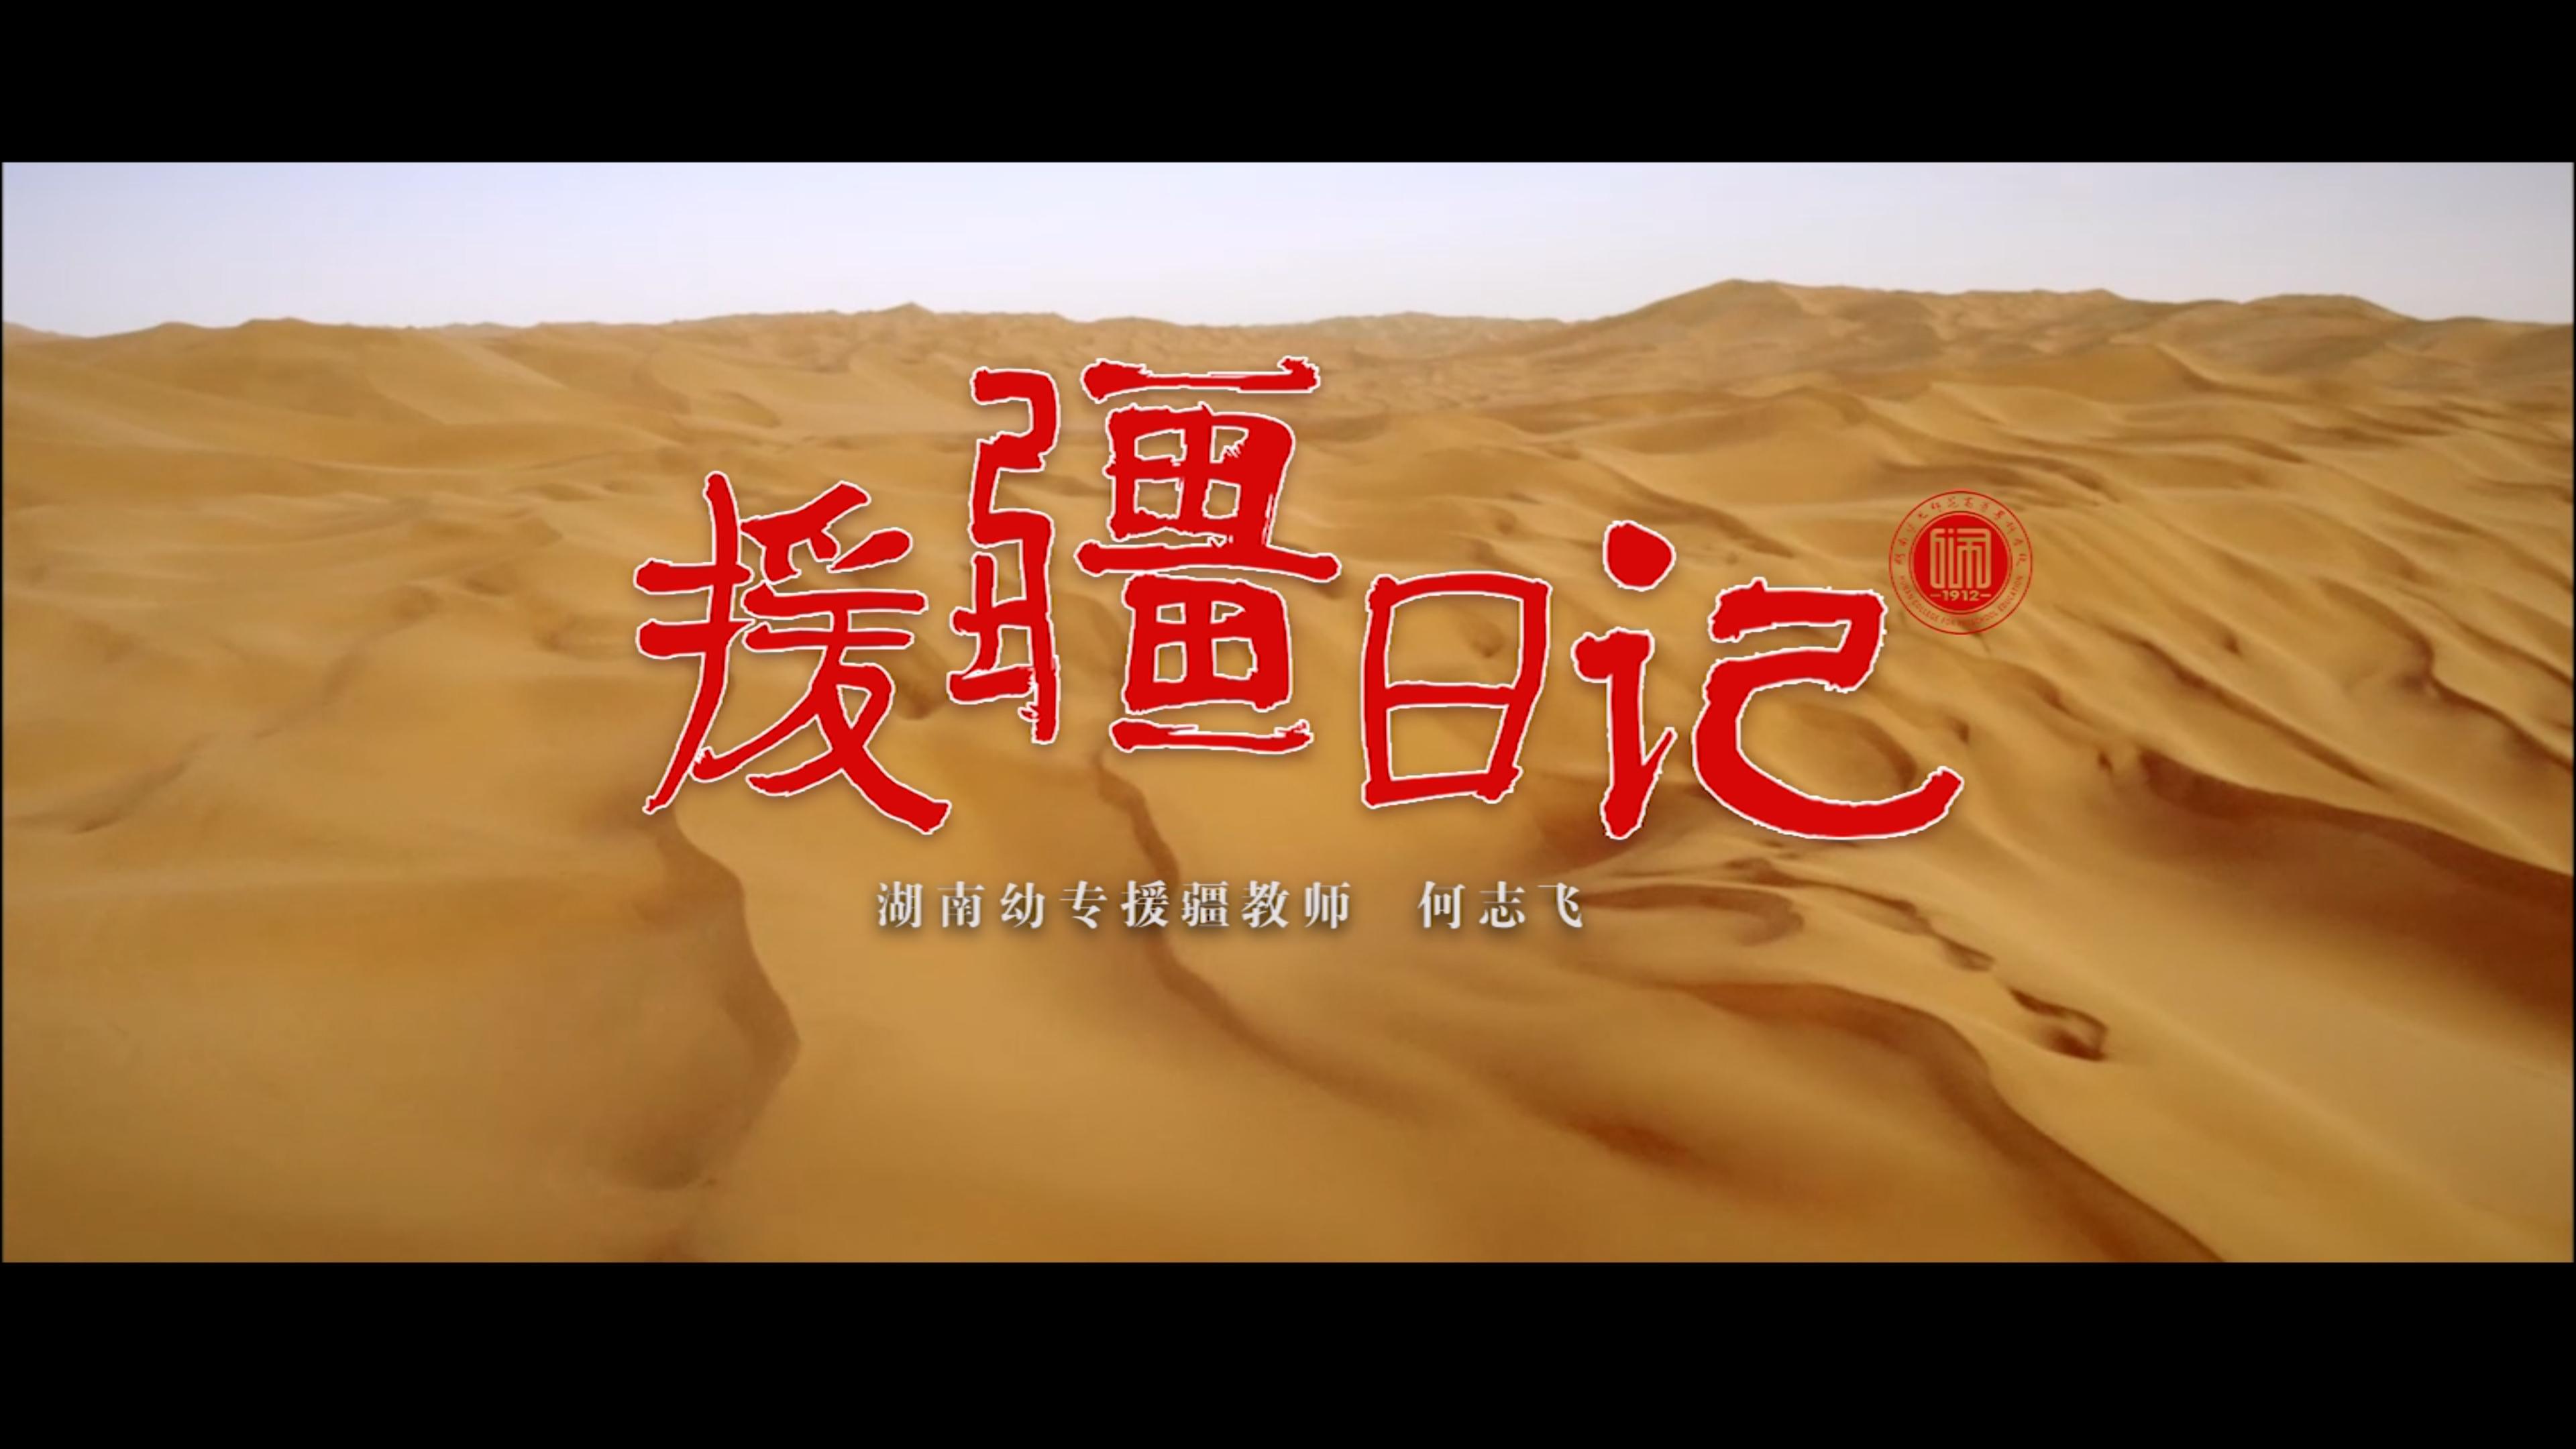 《援疆日记》www.bwin88.com援疆教师 何志飞